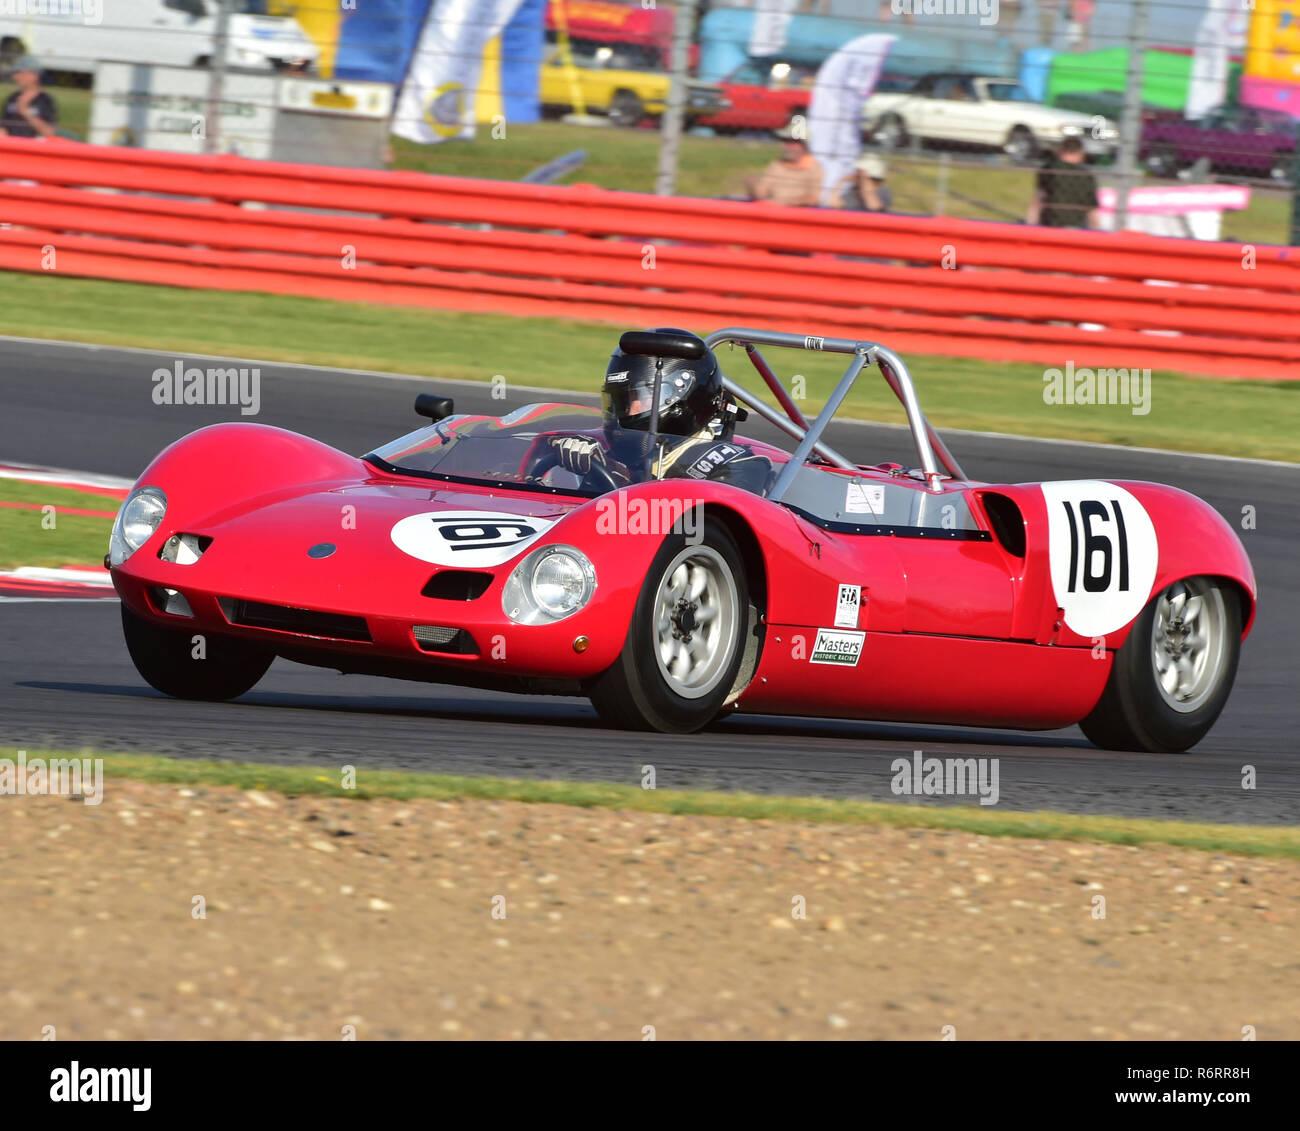 Chris Rea, Elva Mk7S, FIA, Masters Historic Sports Cars